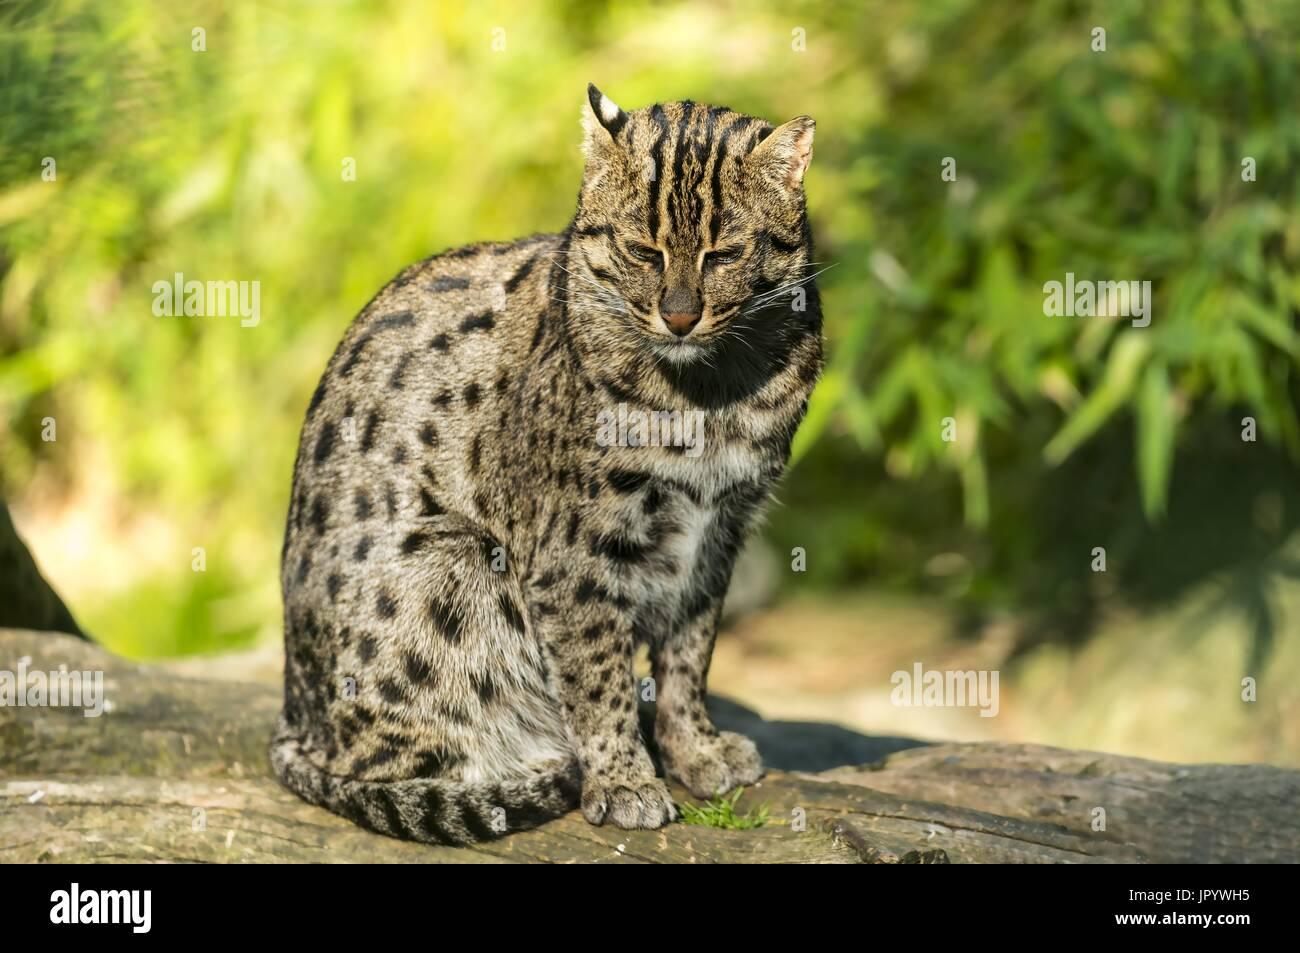 Fishing Cat (Prionailurus viverrinus) sitting on a trunk - Stock Image